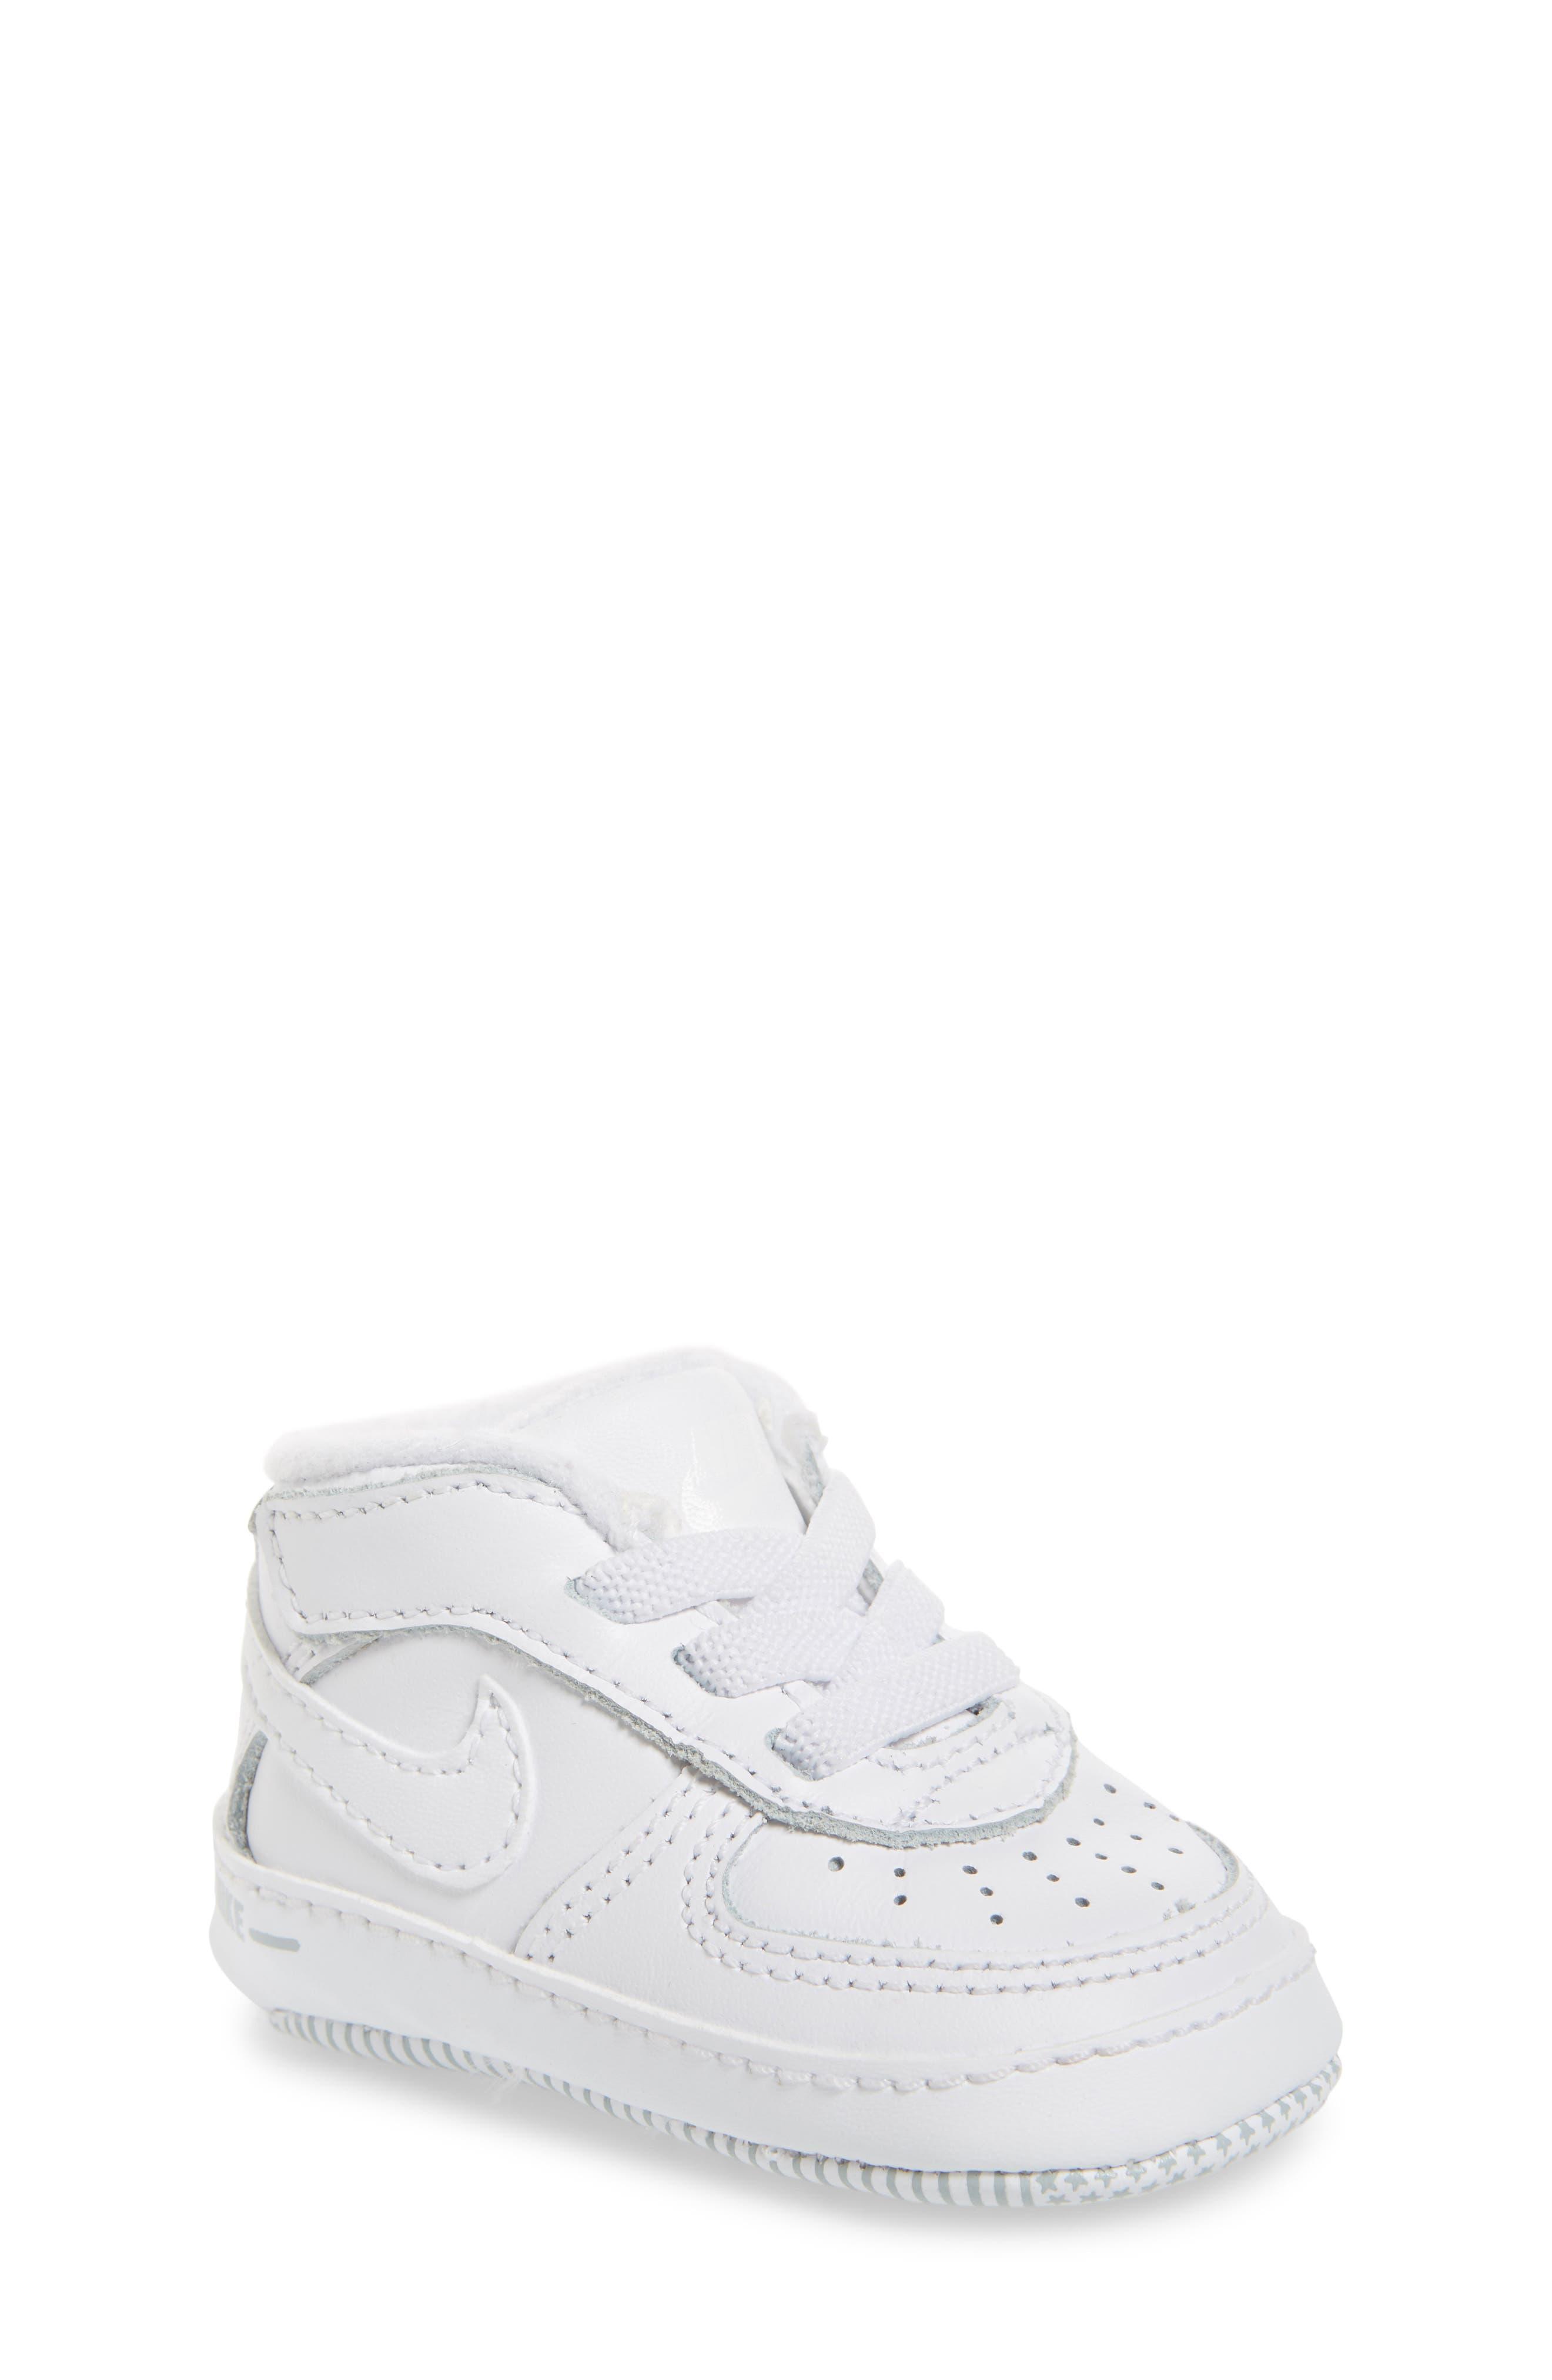 online store 1ba92 814f2 Baby, Walker   Toddler Nike Shoes   Nordstrom